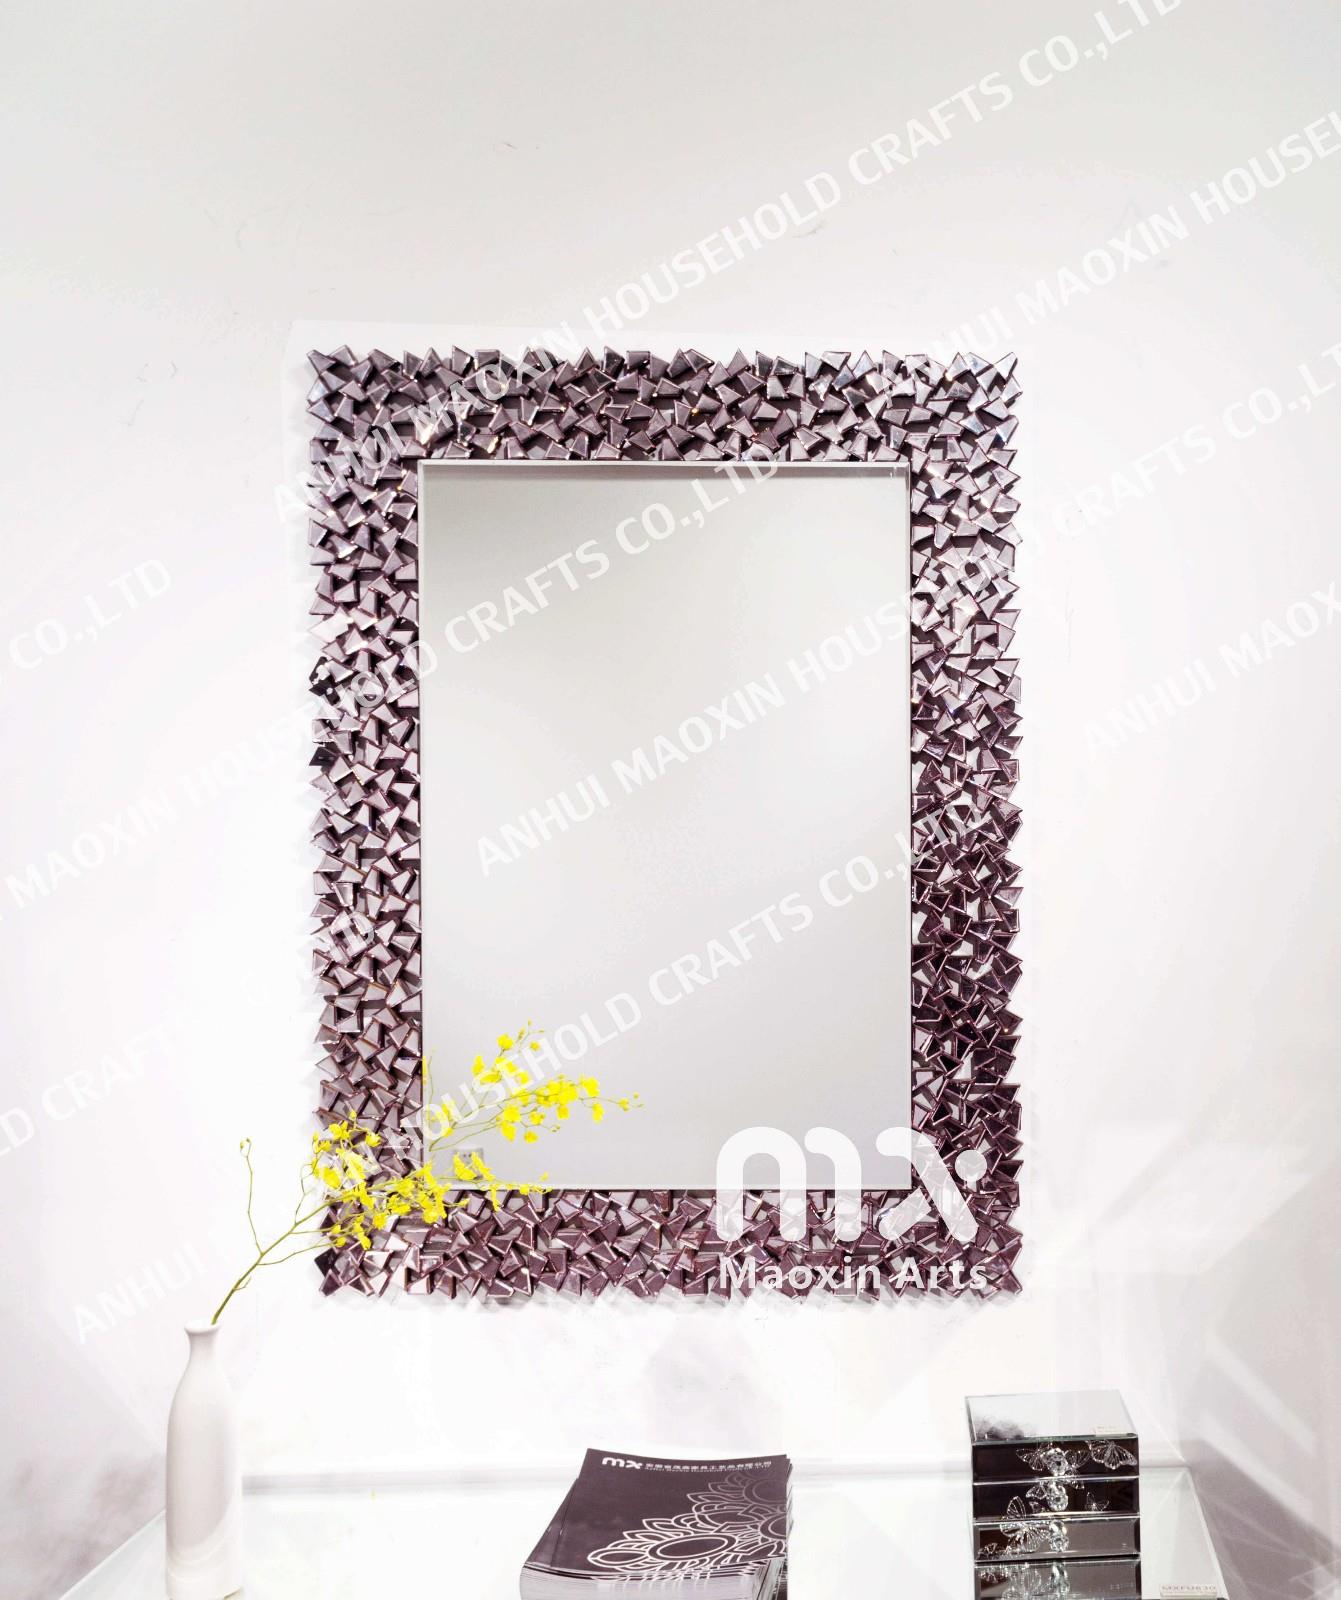 China Customized Pink Frameless Diamond Wall Mirror Throughout Traditional Frameless Diamond Wall Mirrors (Image 2 of 20)